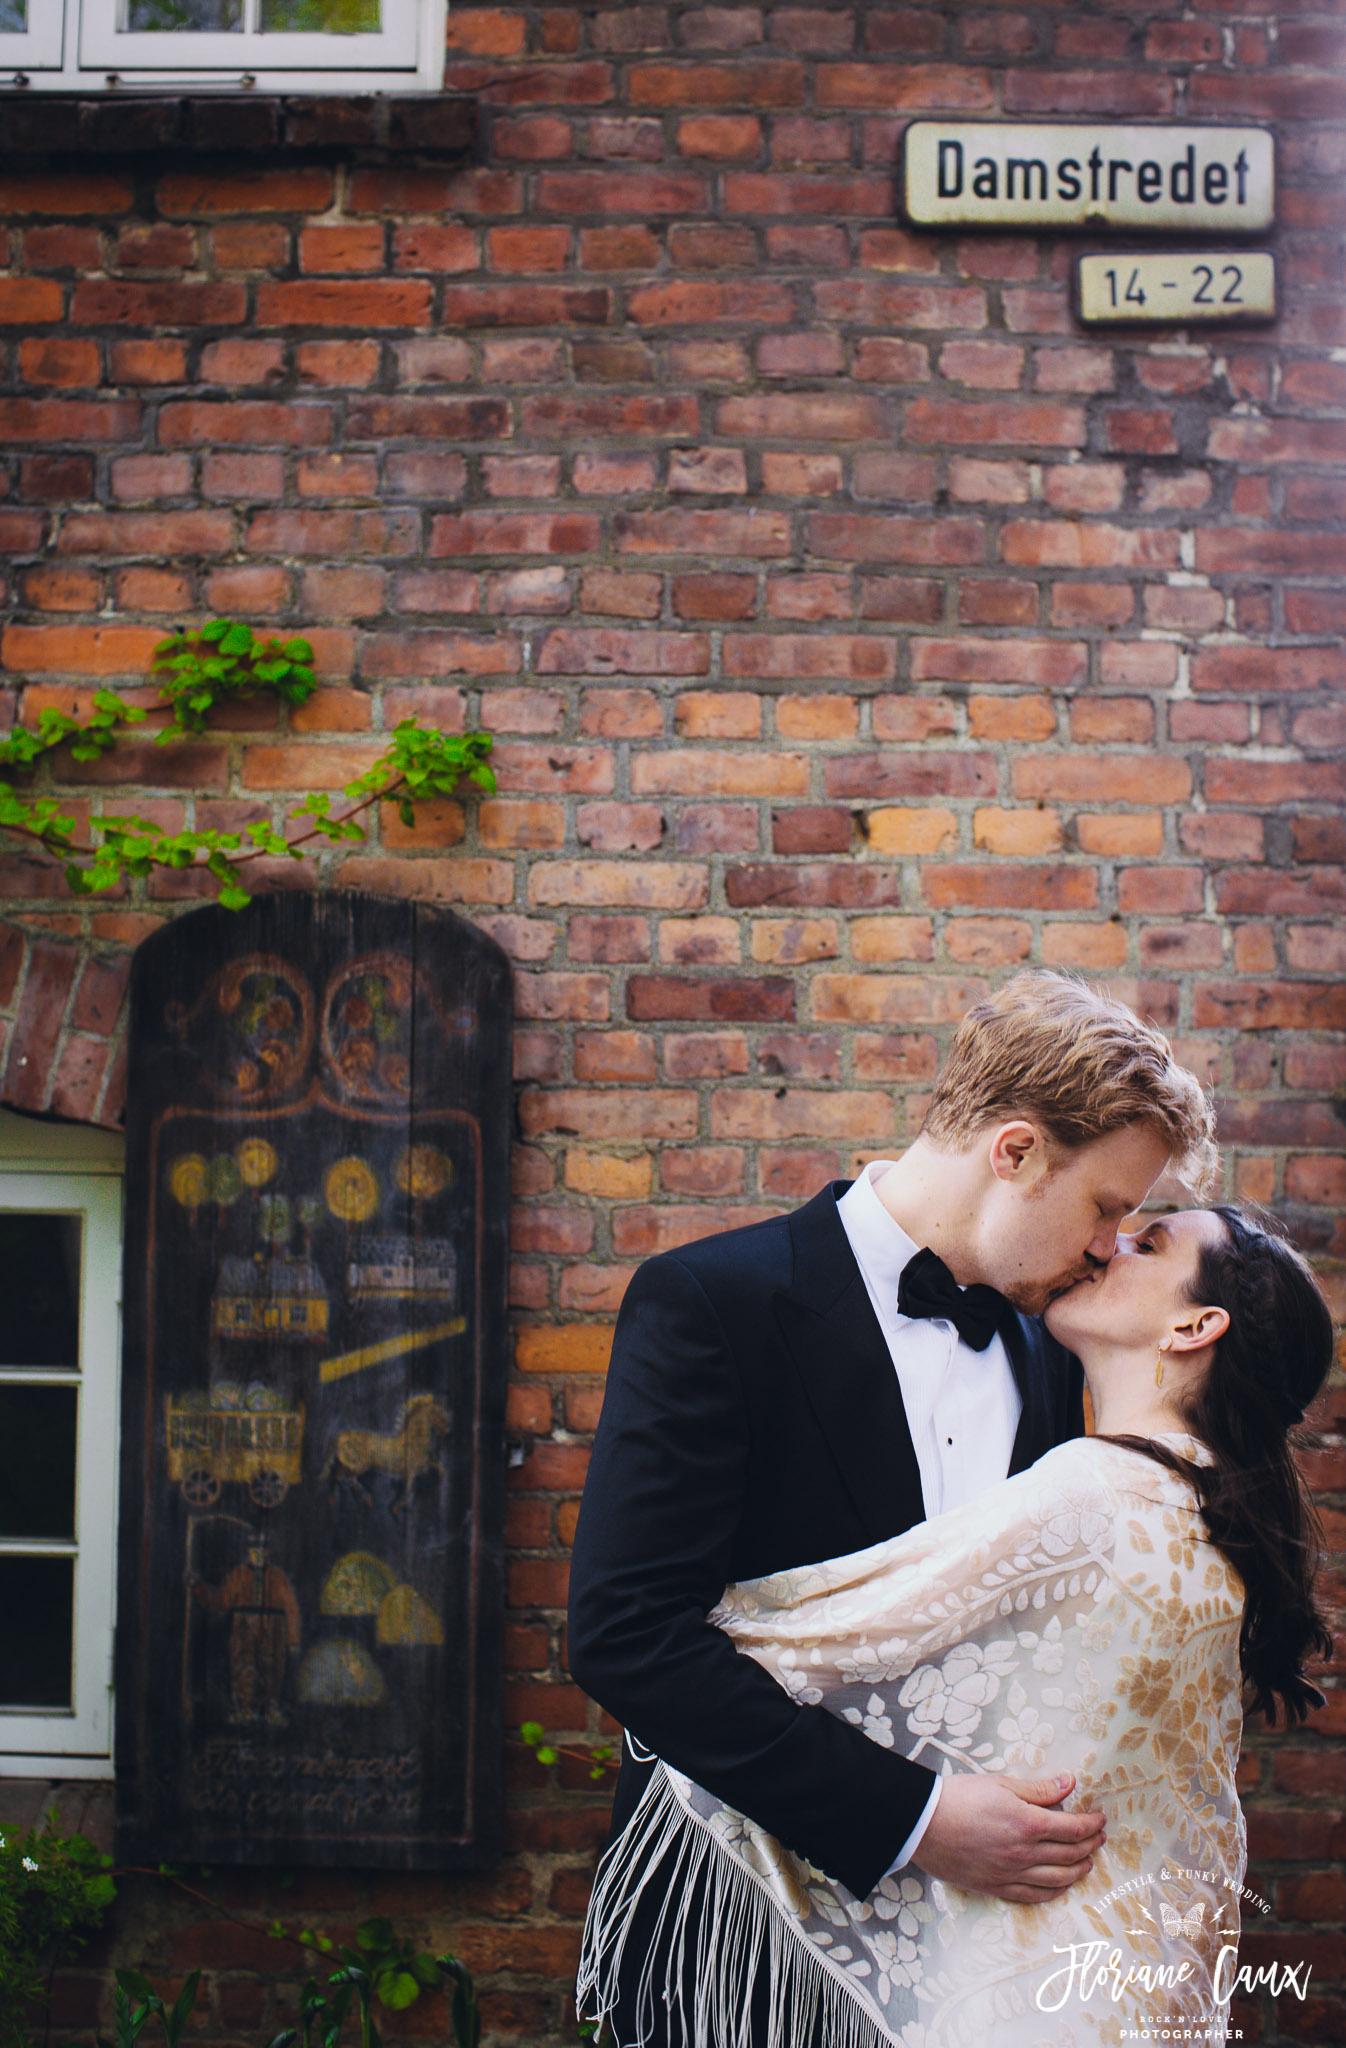 destination-wedding-photographer-oslo-norway-floriane-caux-20